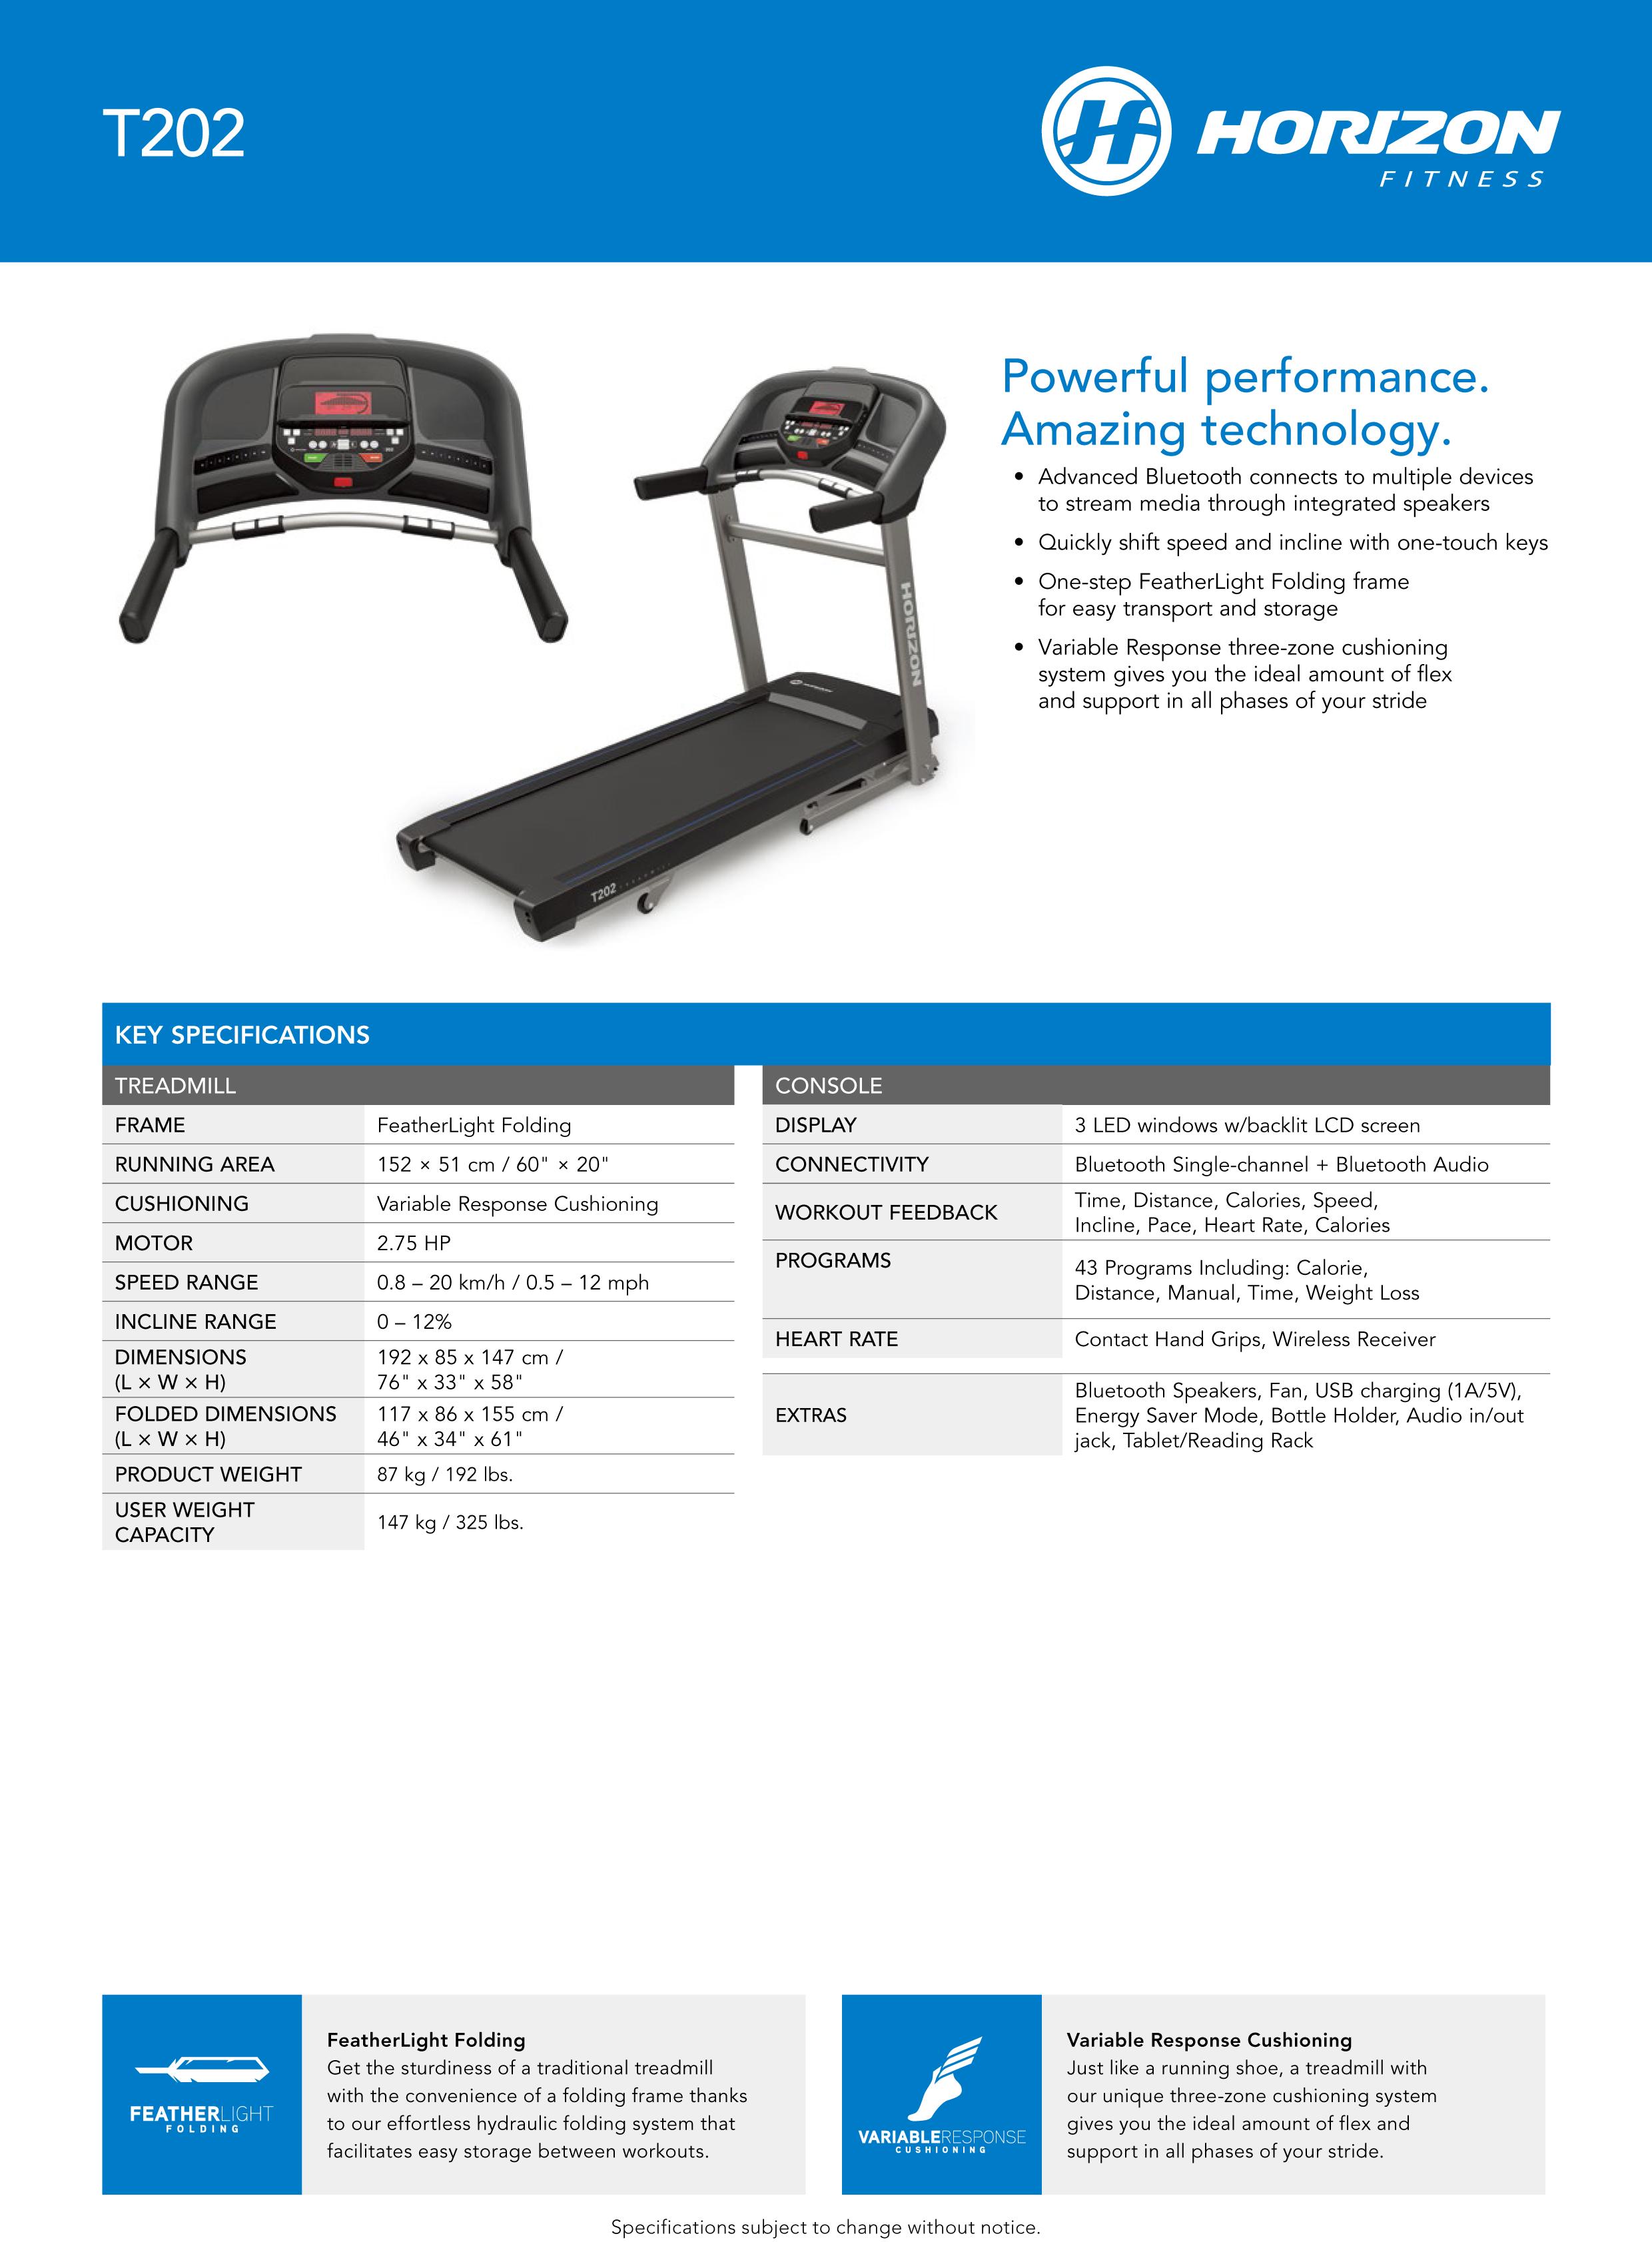 Horizon Treadmill T202 ลู่วิ่งไฟฟ้า (Pre-Order สินค้าพร้อมส่ง 20/07/2020)